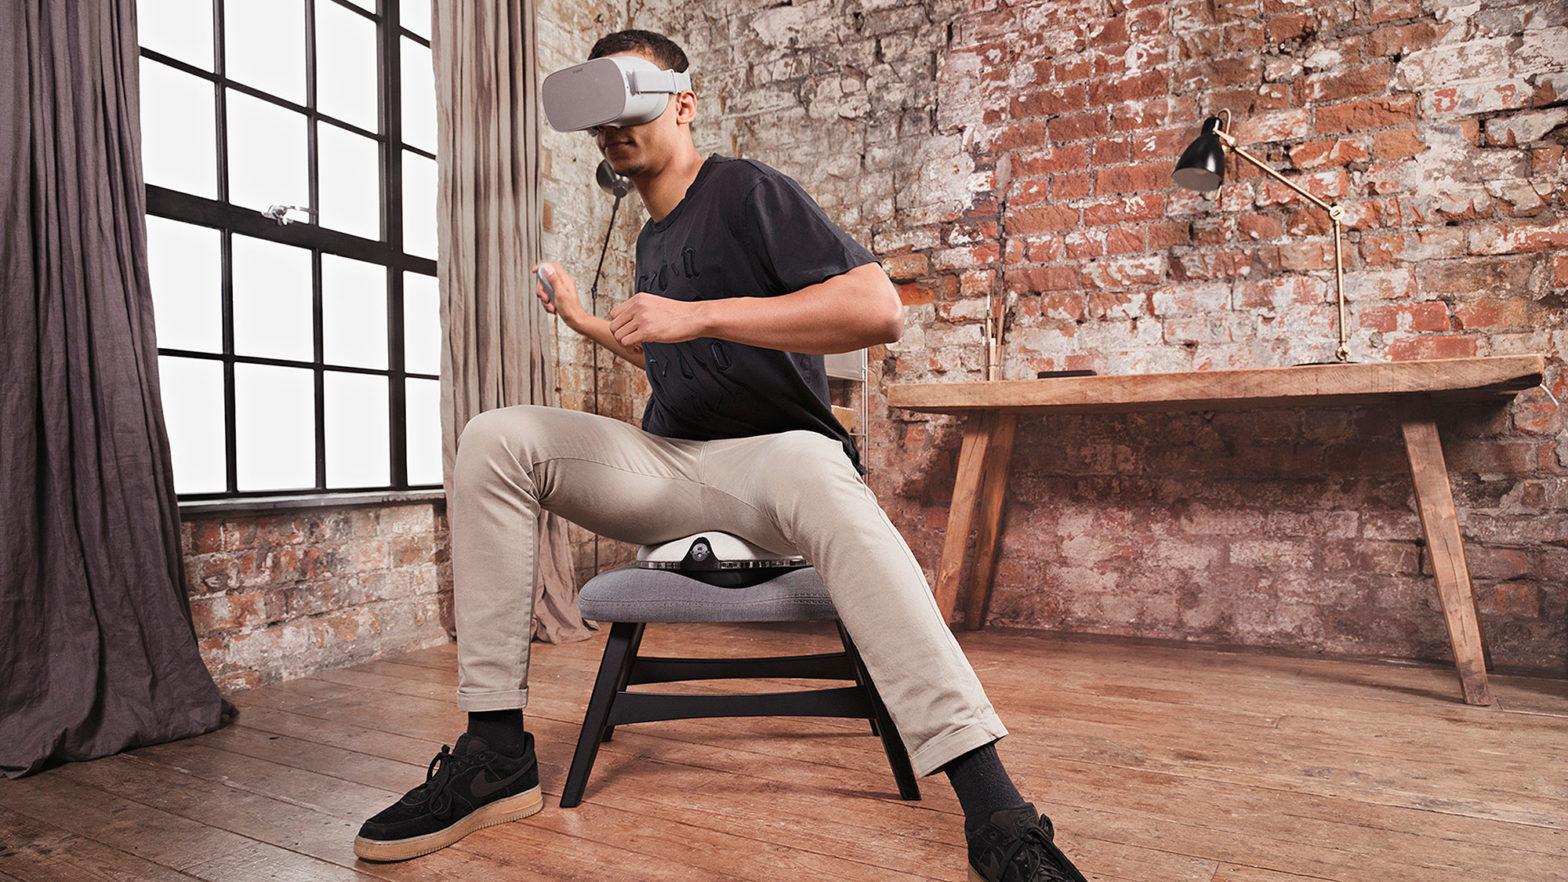 VRGO MINI VR Locomotion and Haptics